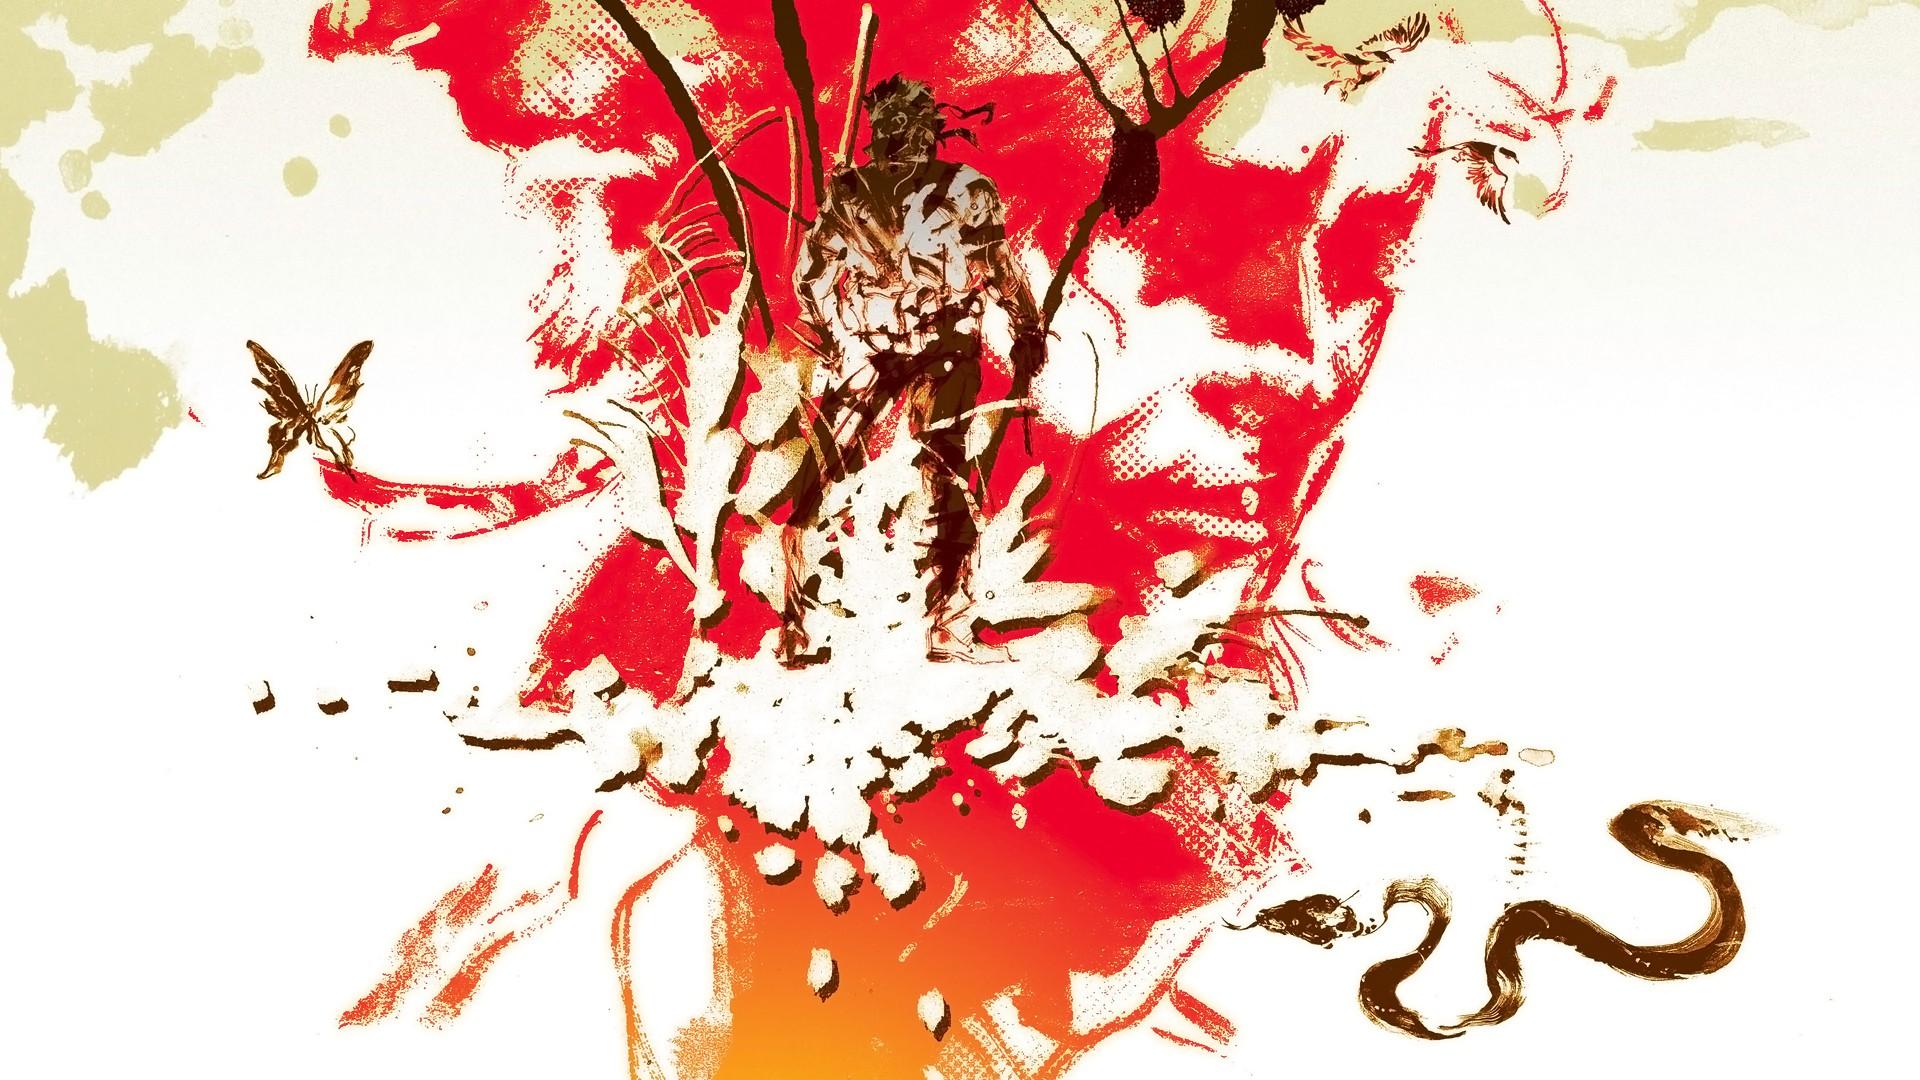 Wallpaper Illustration Video Games Artwork Metal Gear